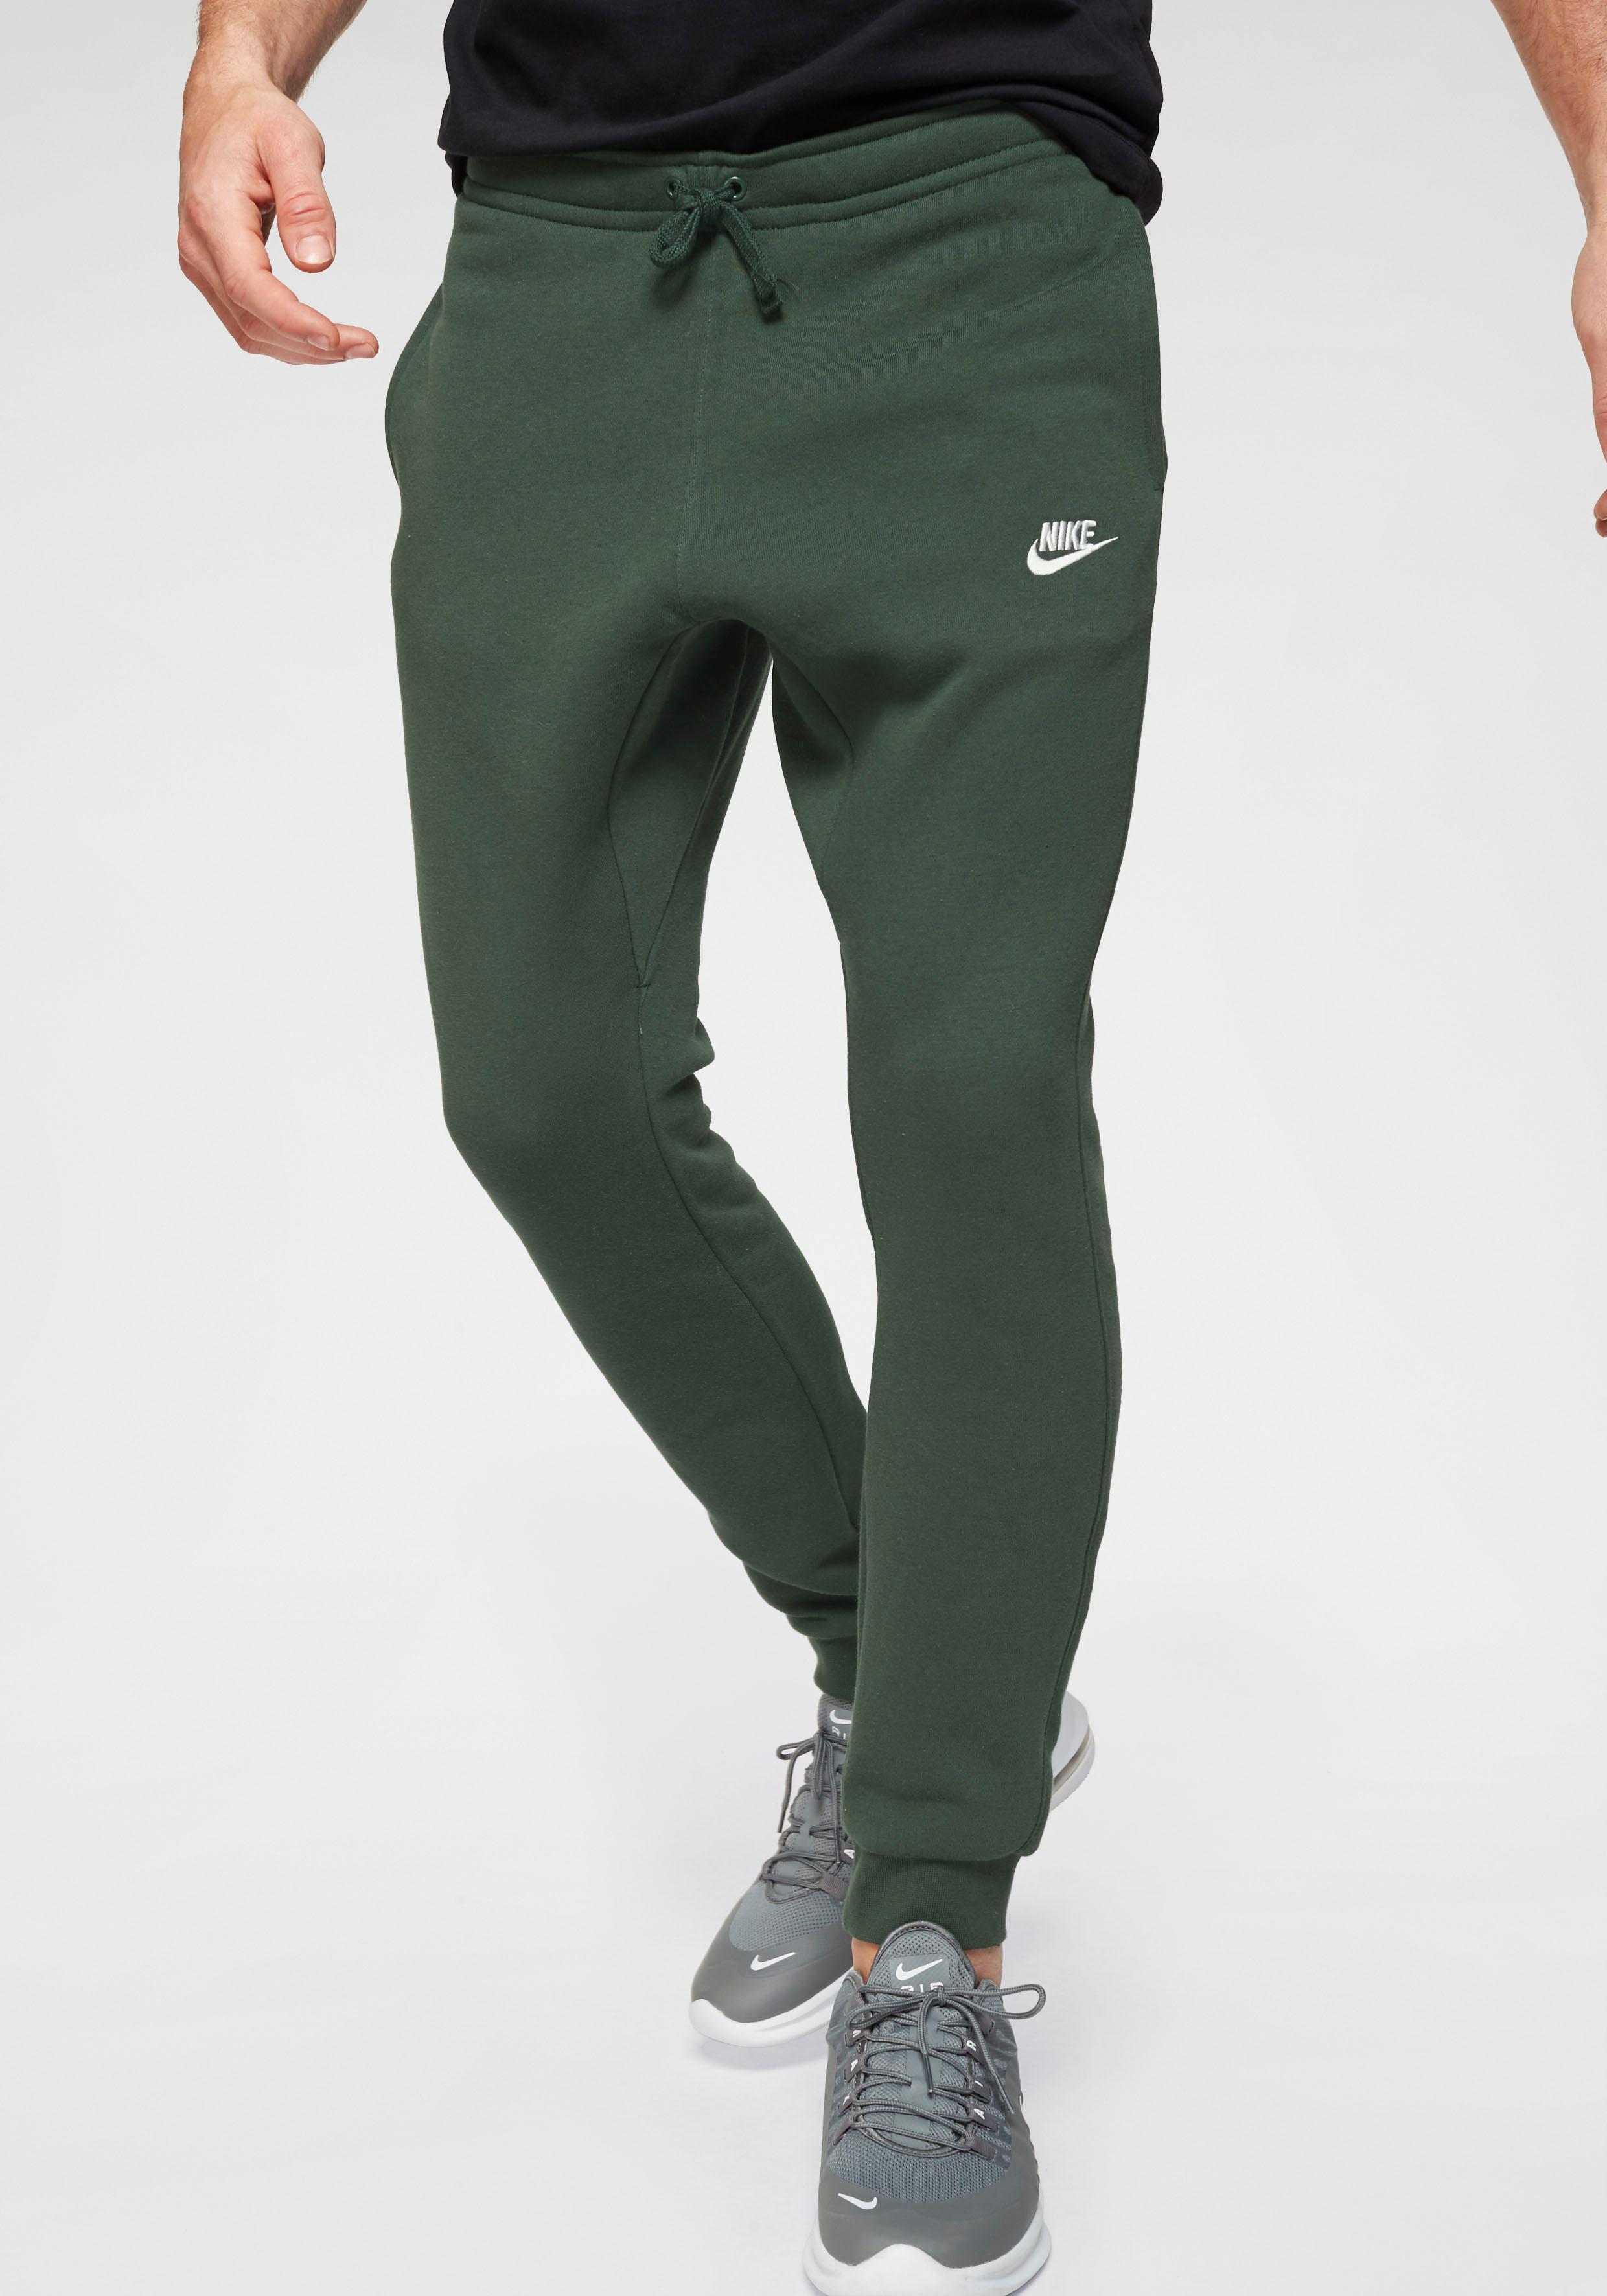 Nike Sportswear Jogginghose NSW JOGGER | Sportbekleidung > Sporthosen | Grün | Nike Sportswear